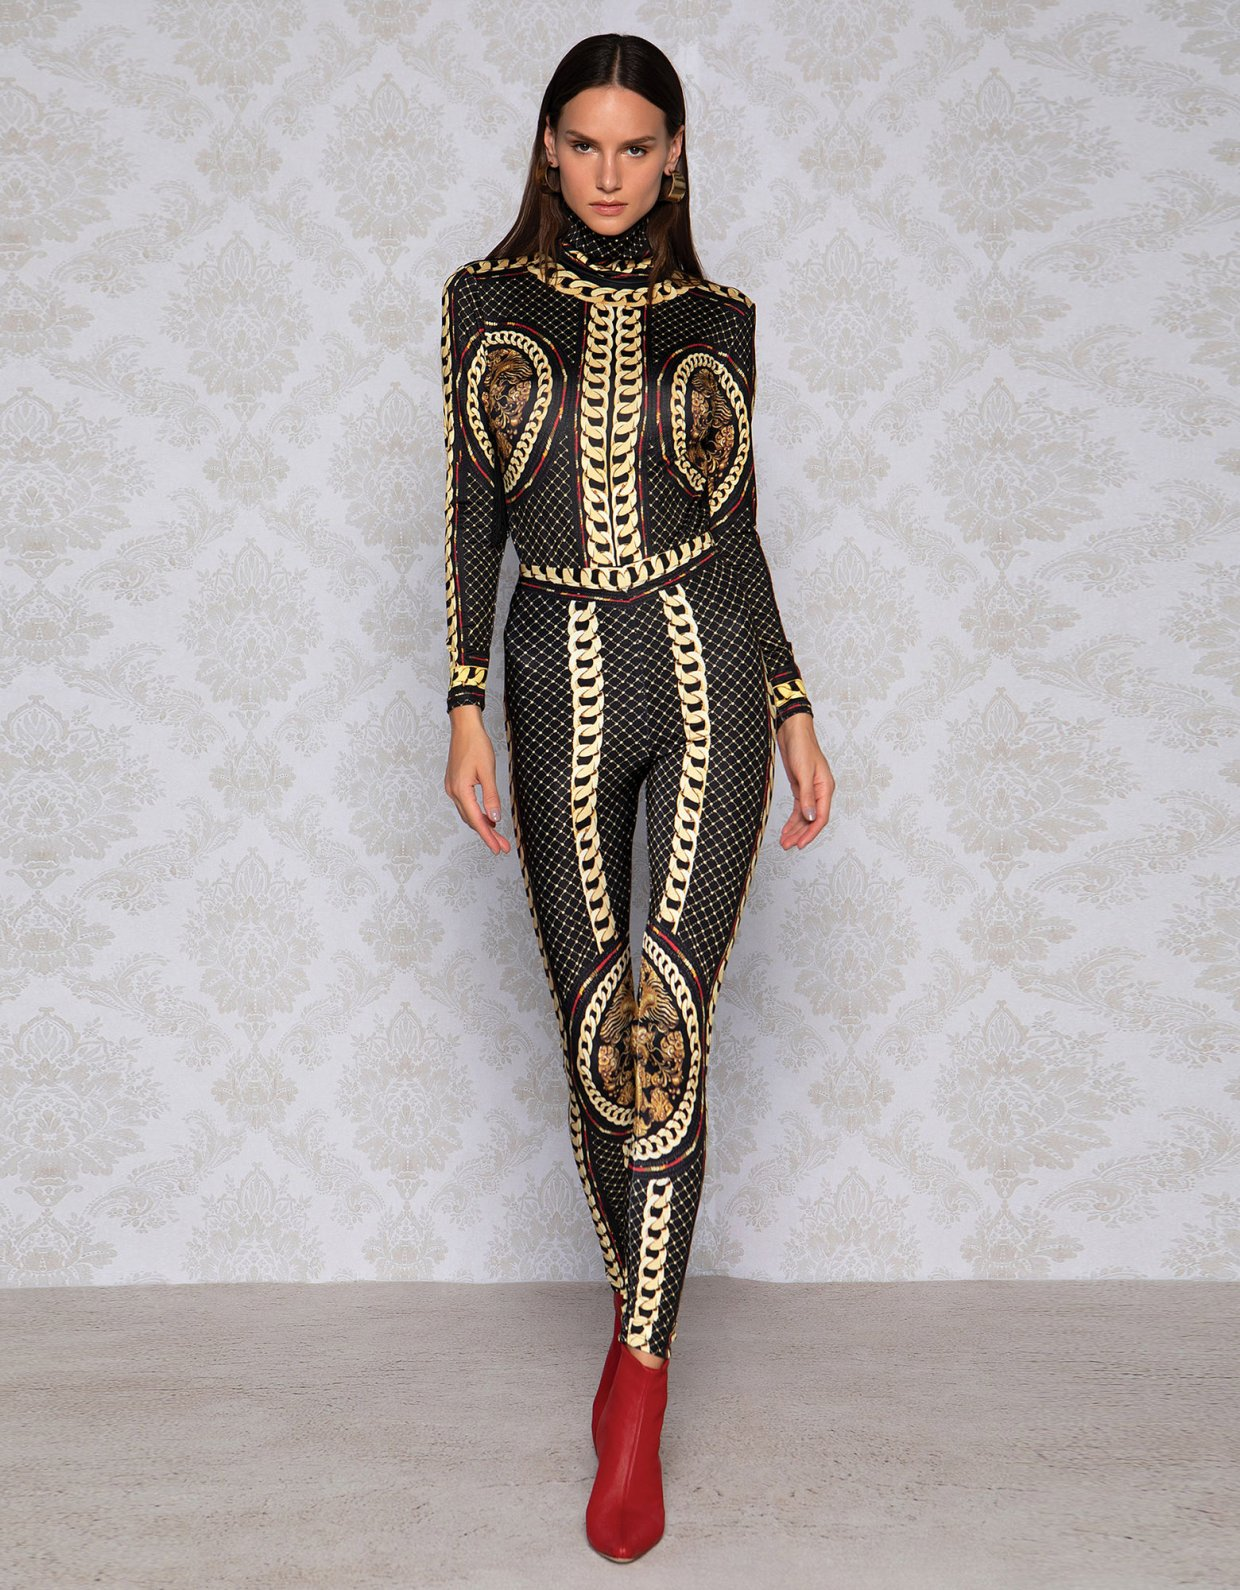 Peace & Chaos Gold chain leggings